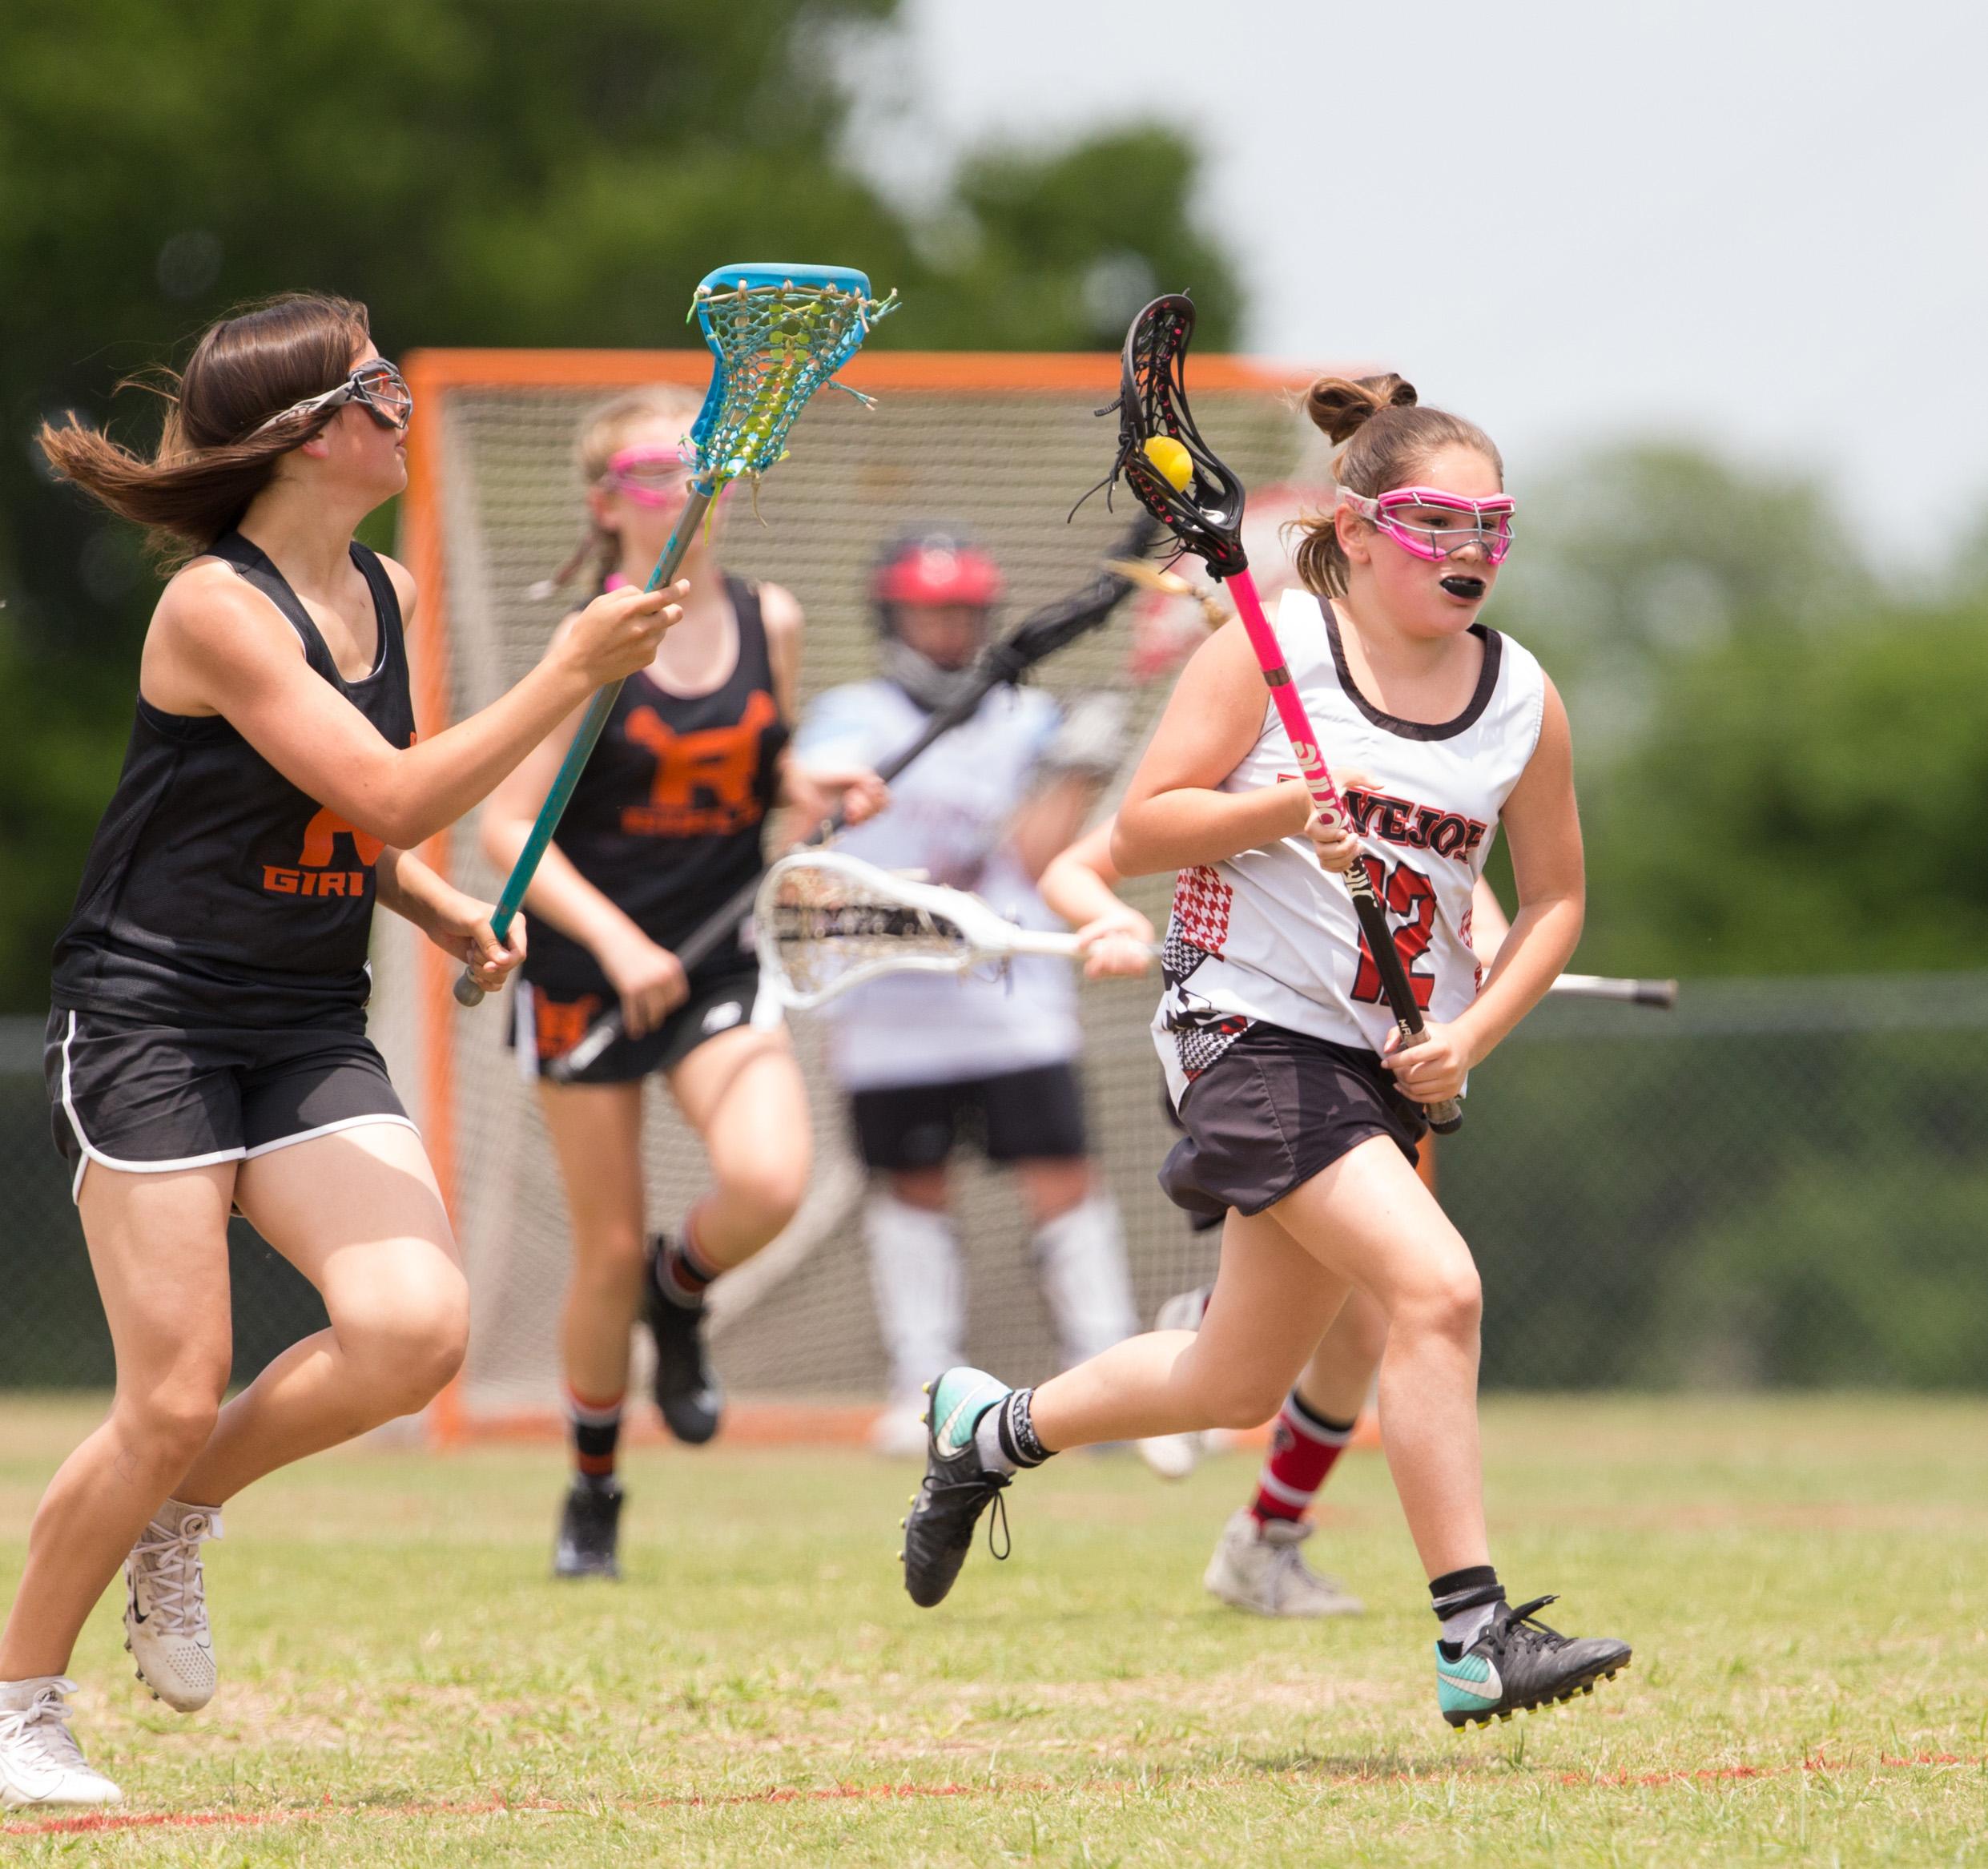 Rising 7th grader, Claire Diaz, cutting through the Rockwall defense.